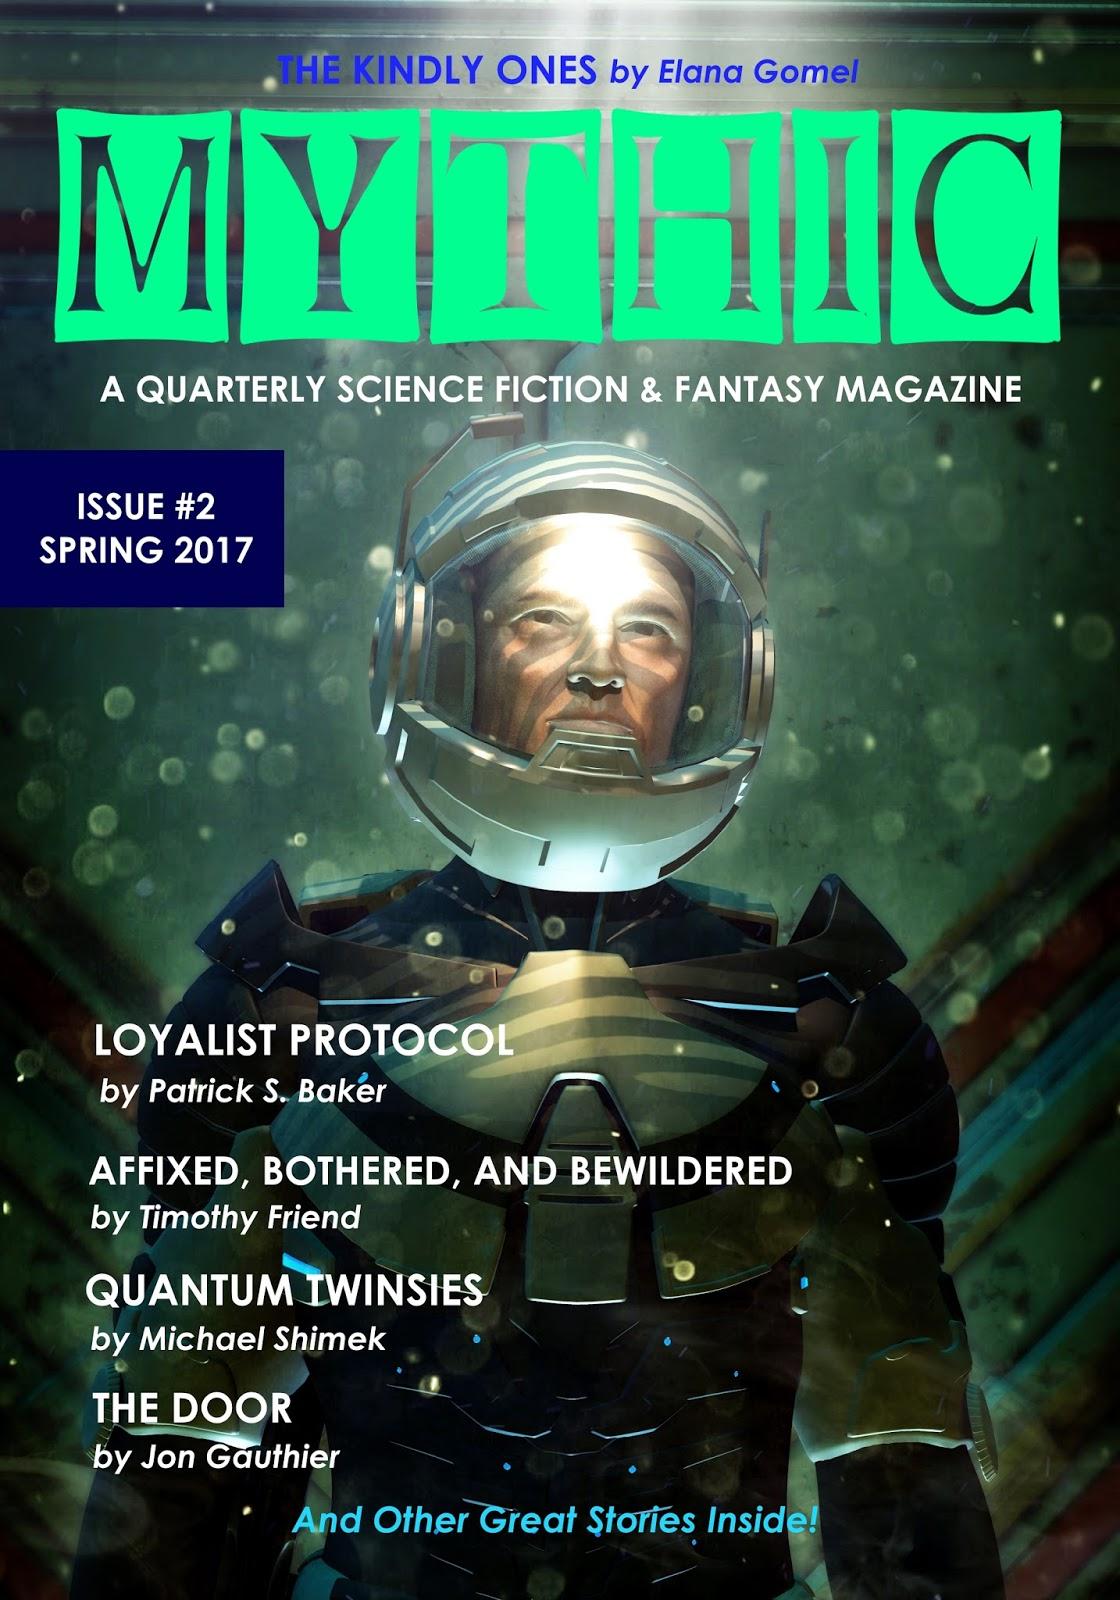 mythic issue 2